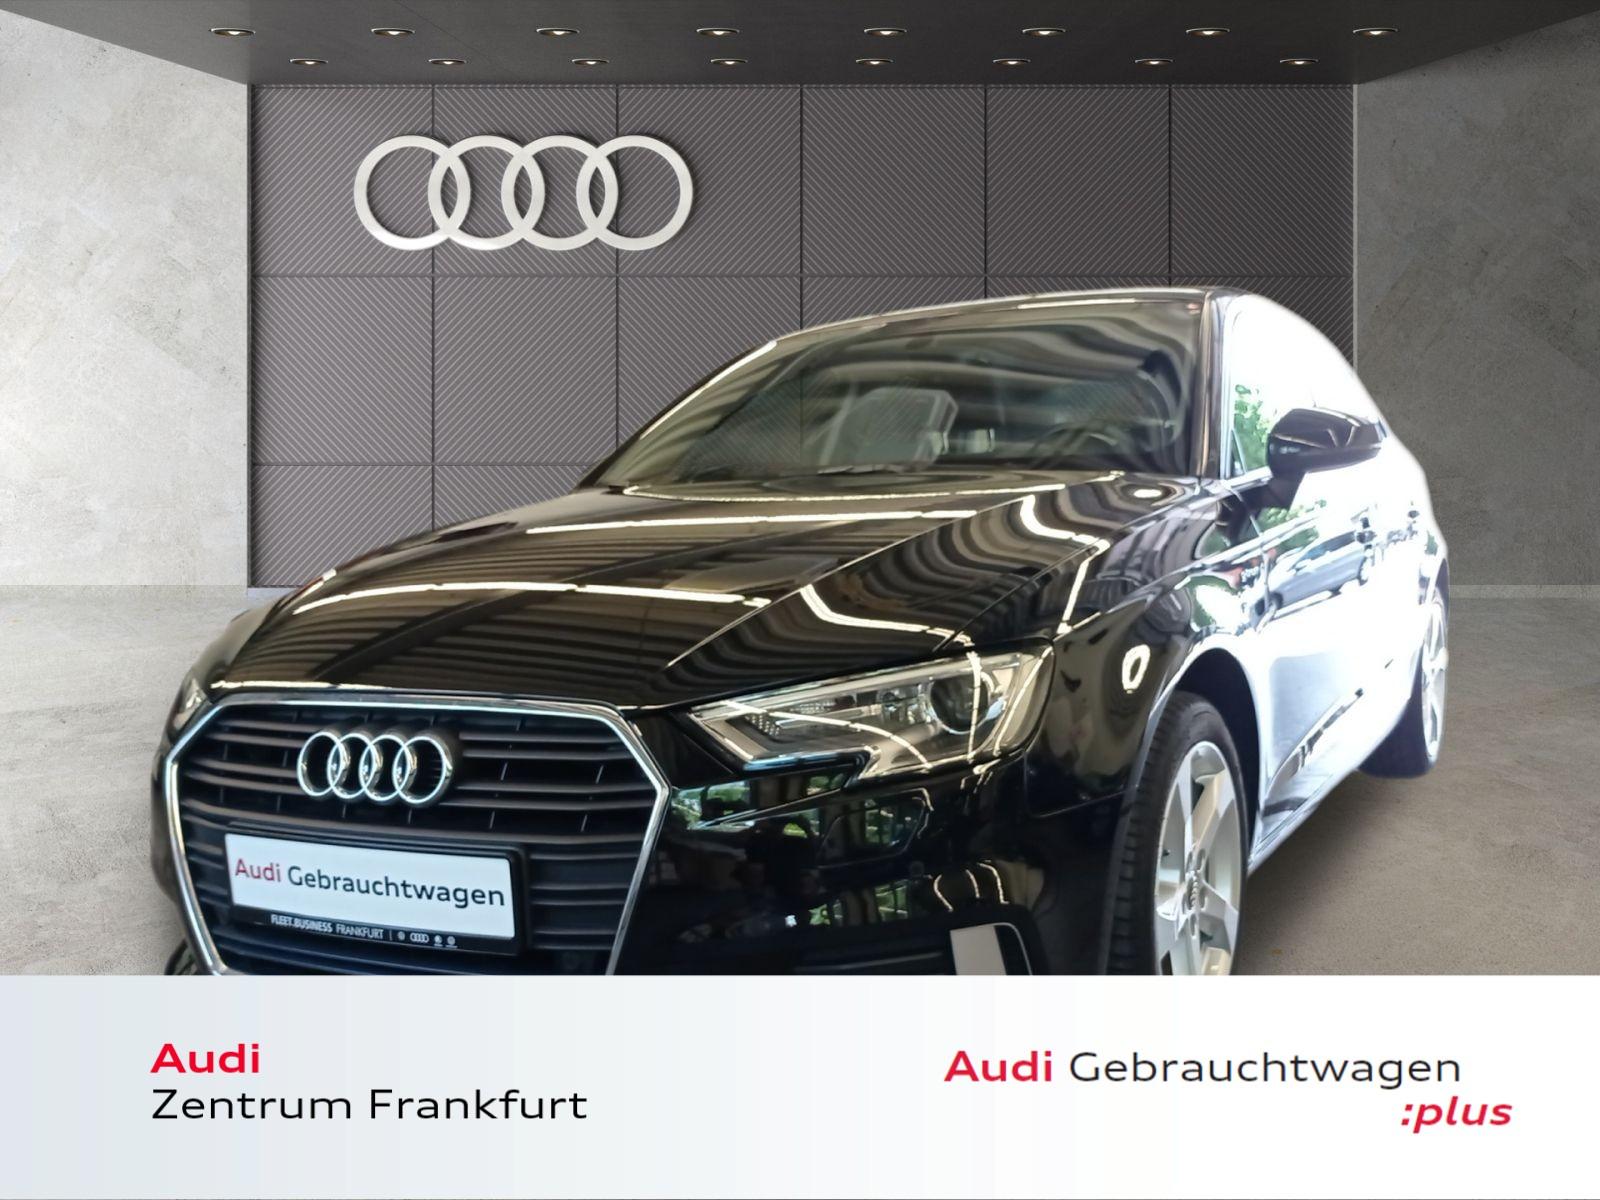 Audi A3 Sportback g-tron 1.4 TFSI S tronic sport Xenon Navi PDC Sitzheizung, Jahr 2018, other